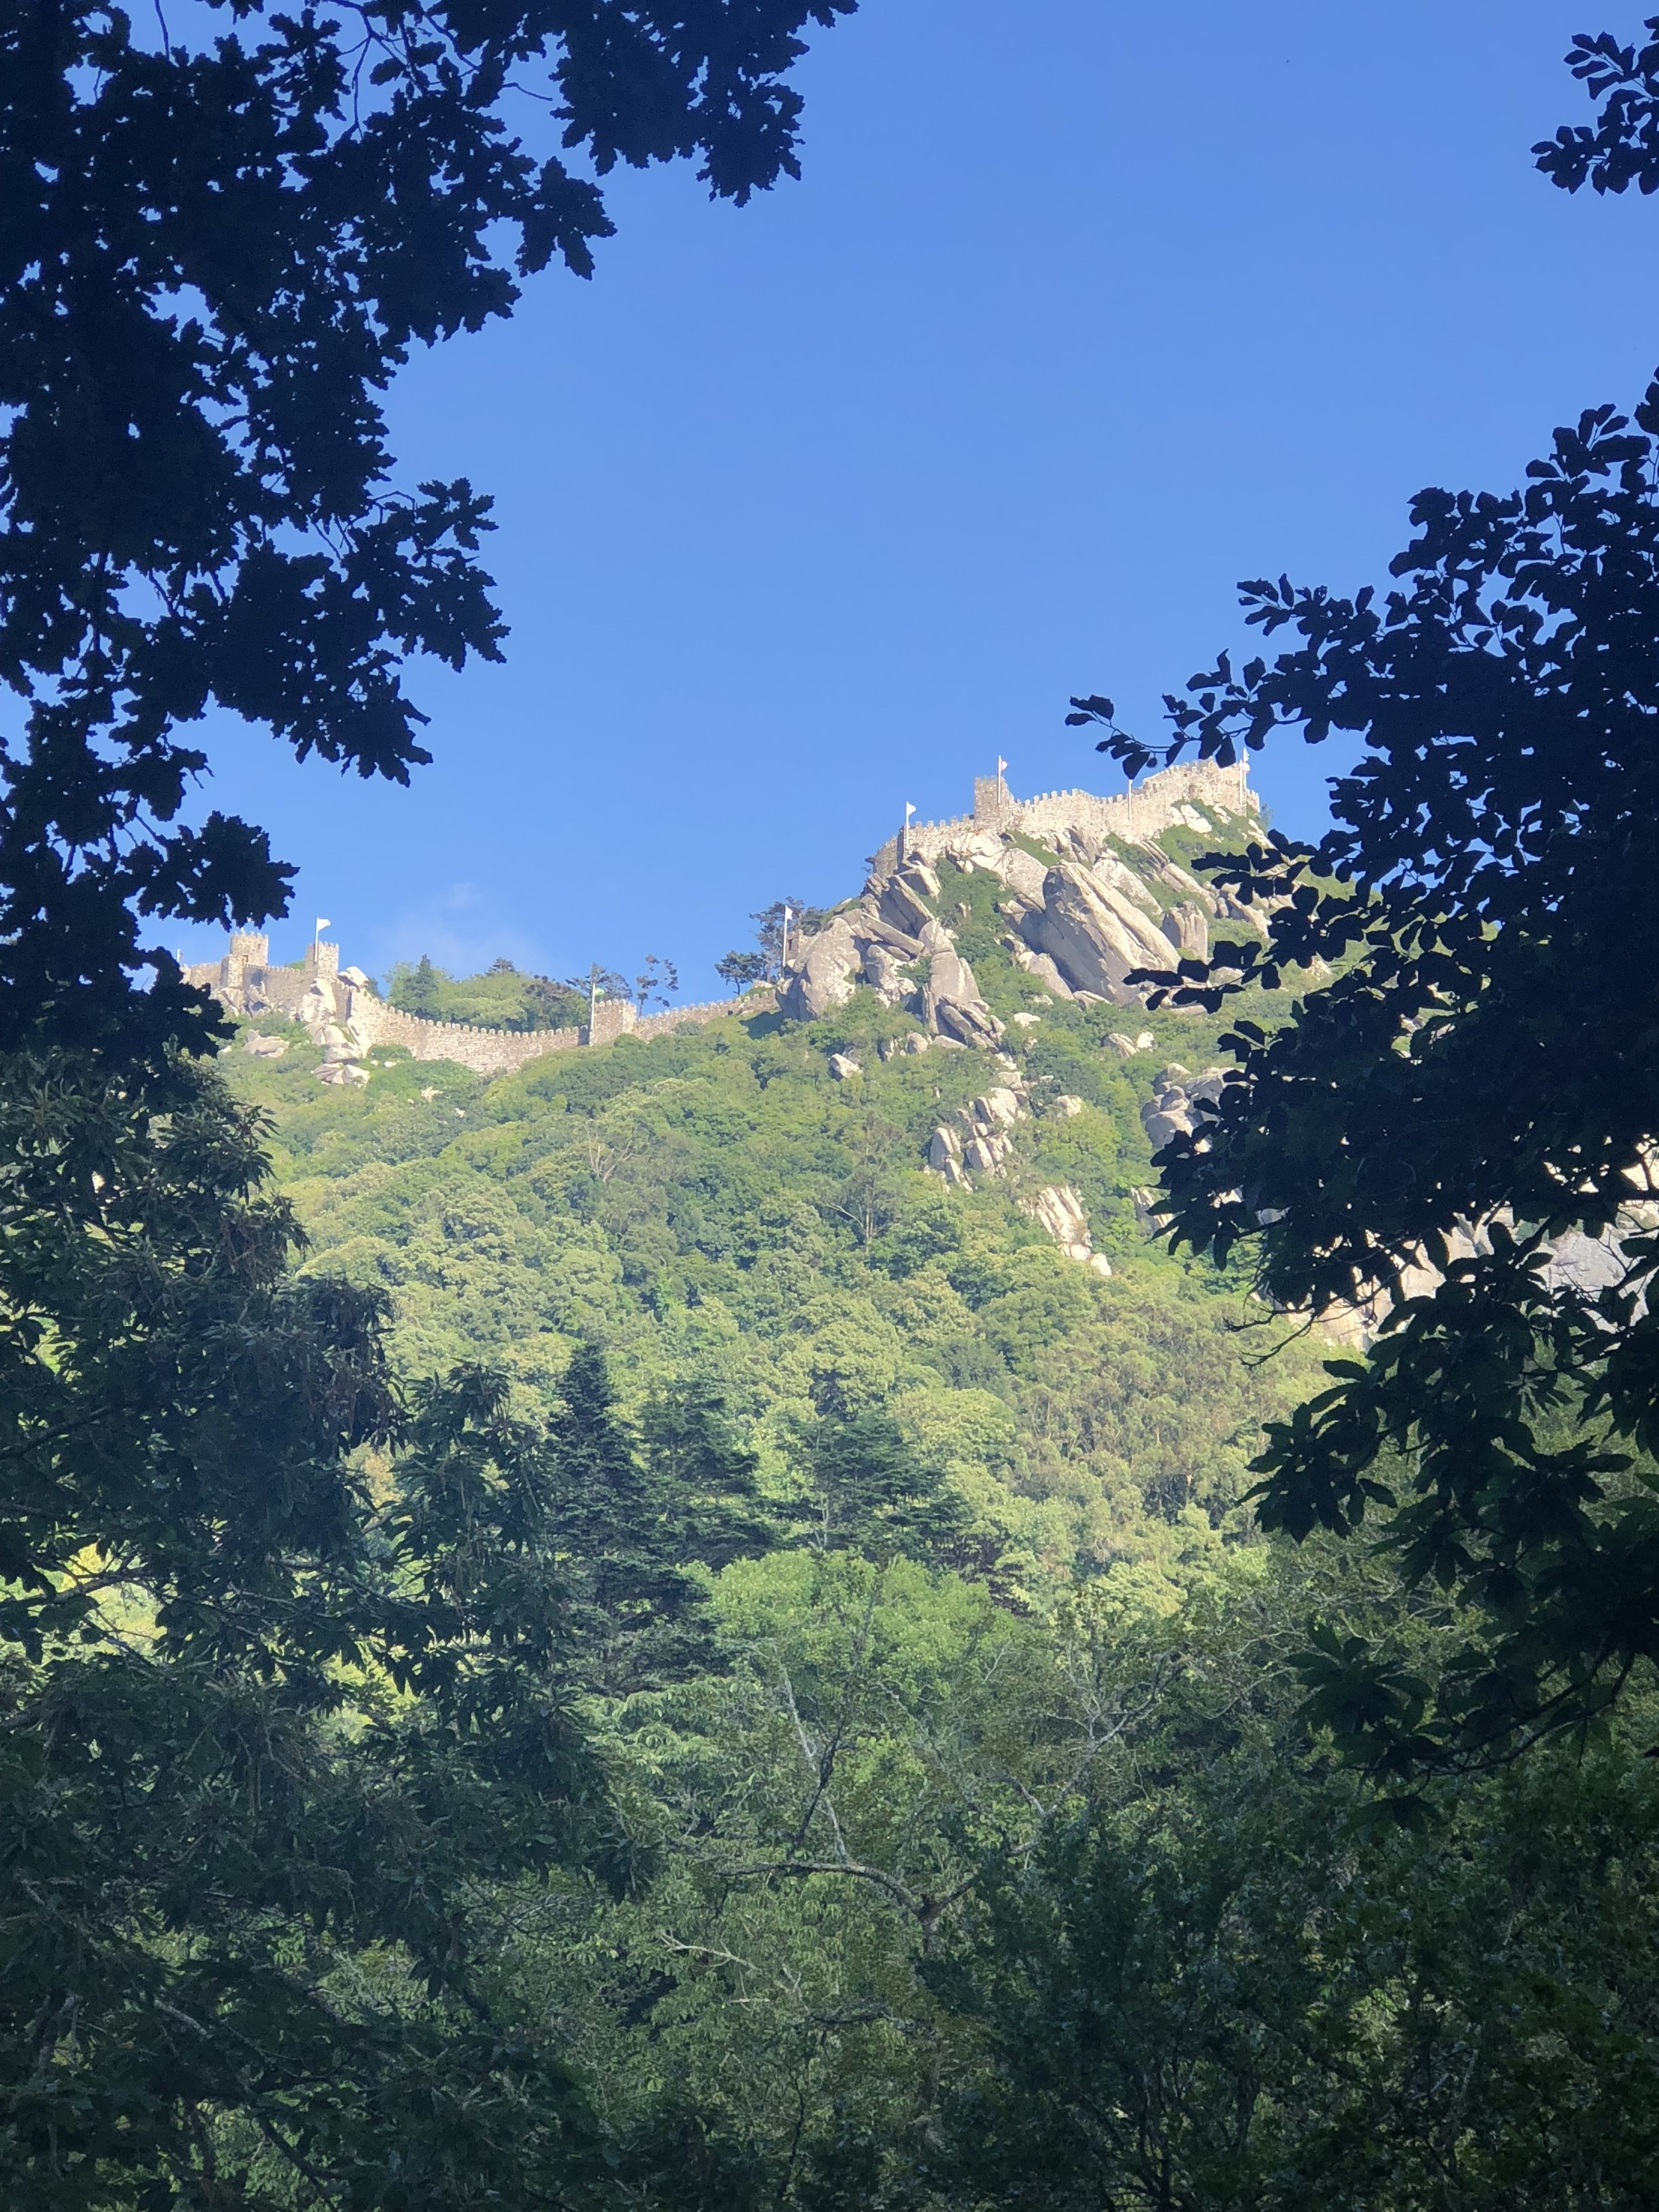 View of Moor's Castle from Quinta da Regaleira